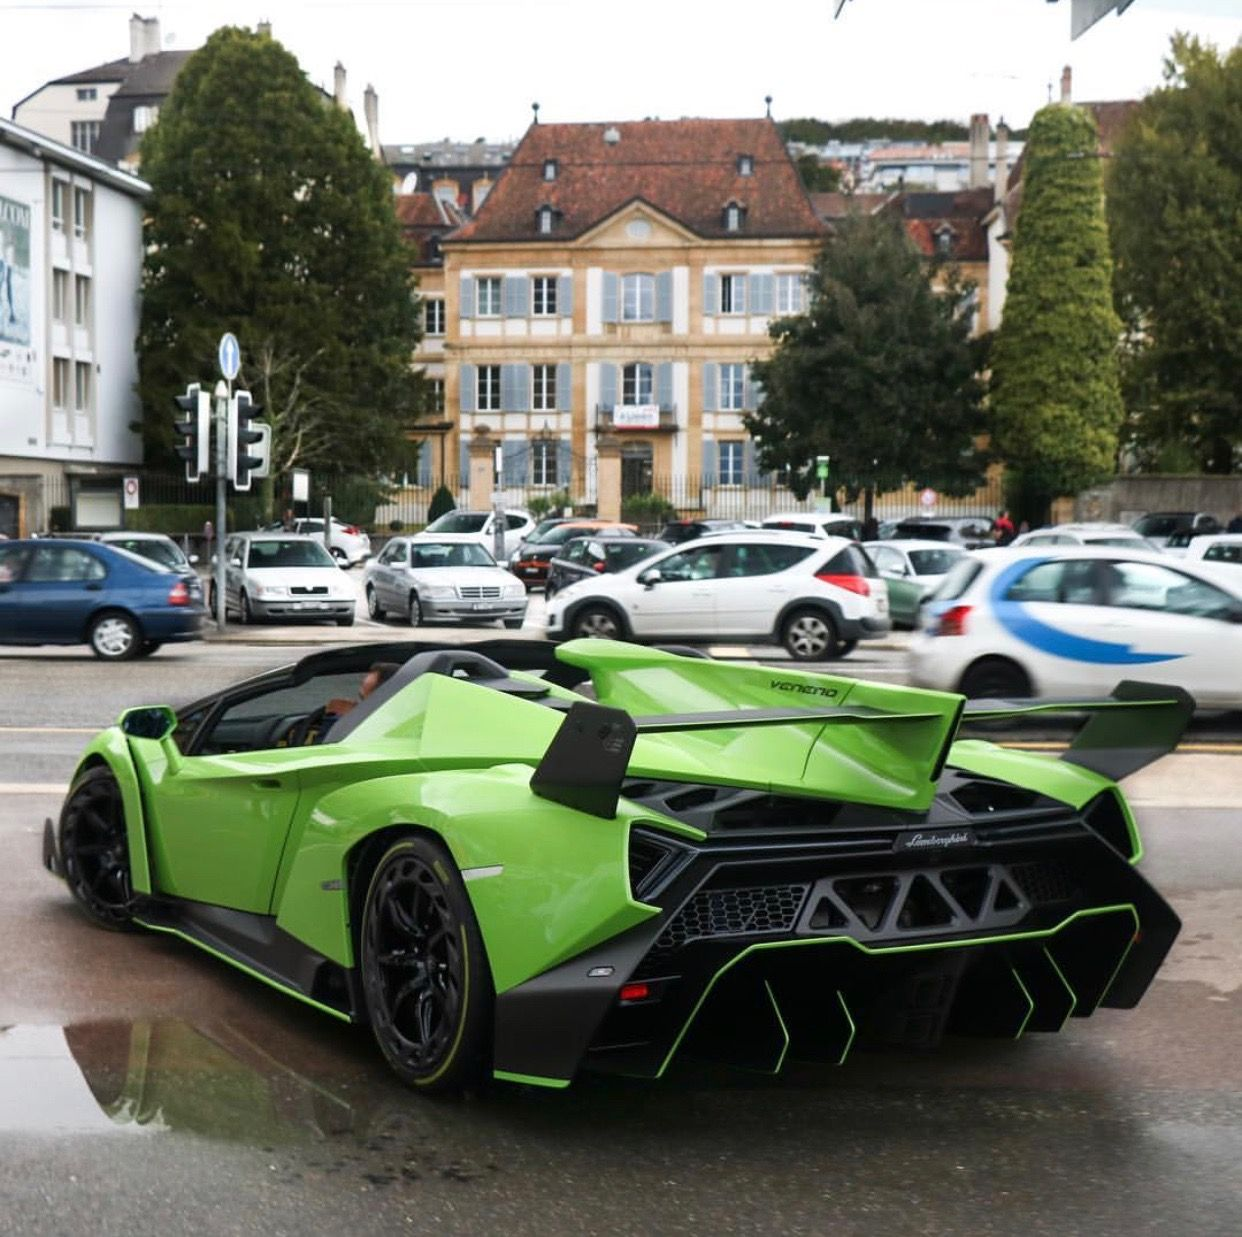 Bon Lamborghini Veneno Roadster Painted In Verde Miura W/ Exposed Carbon Fiber  Photo Taken By: